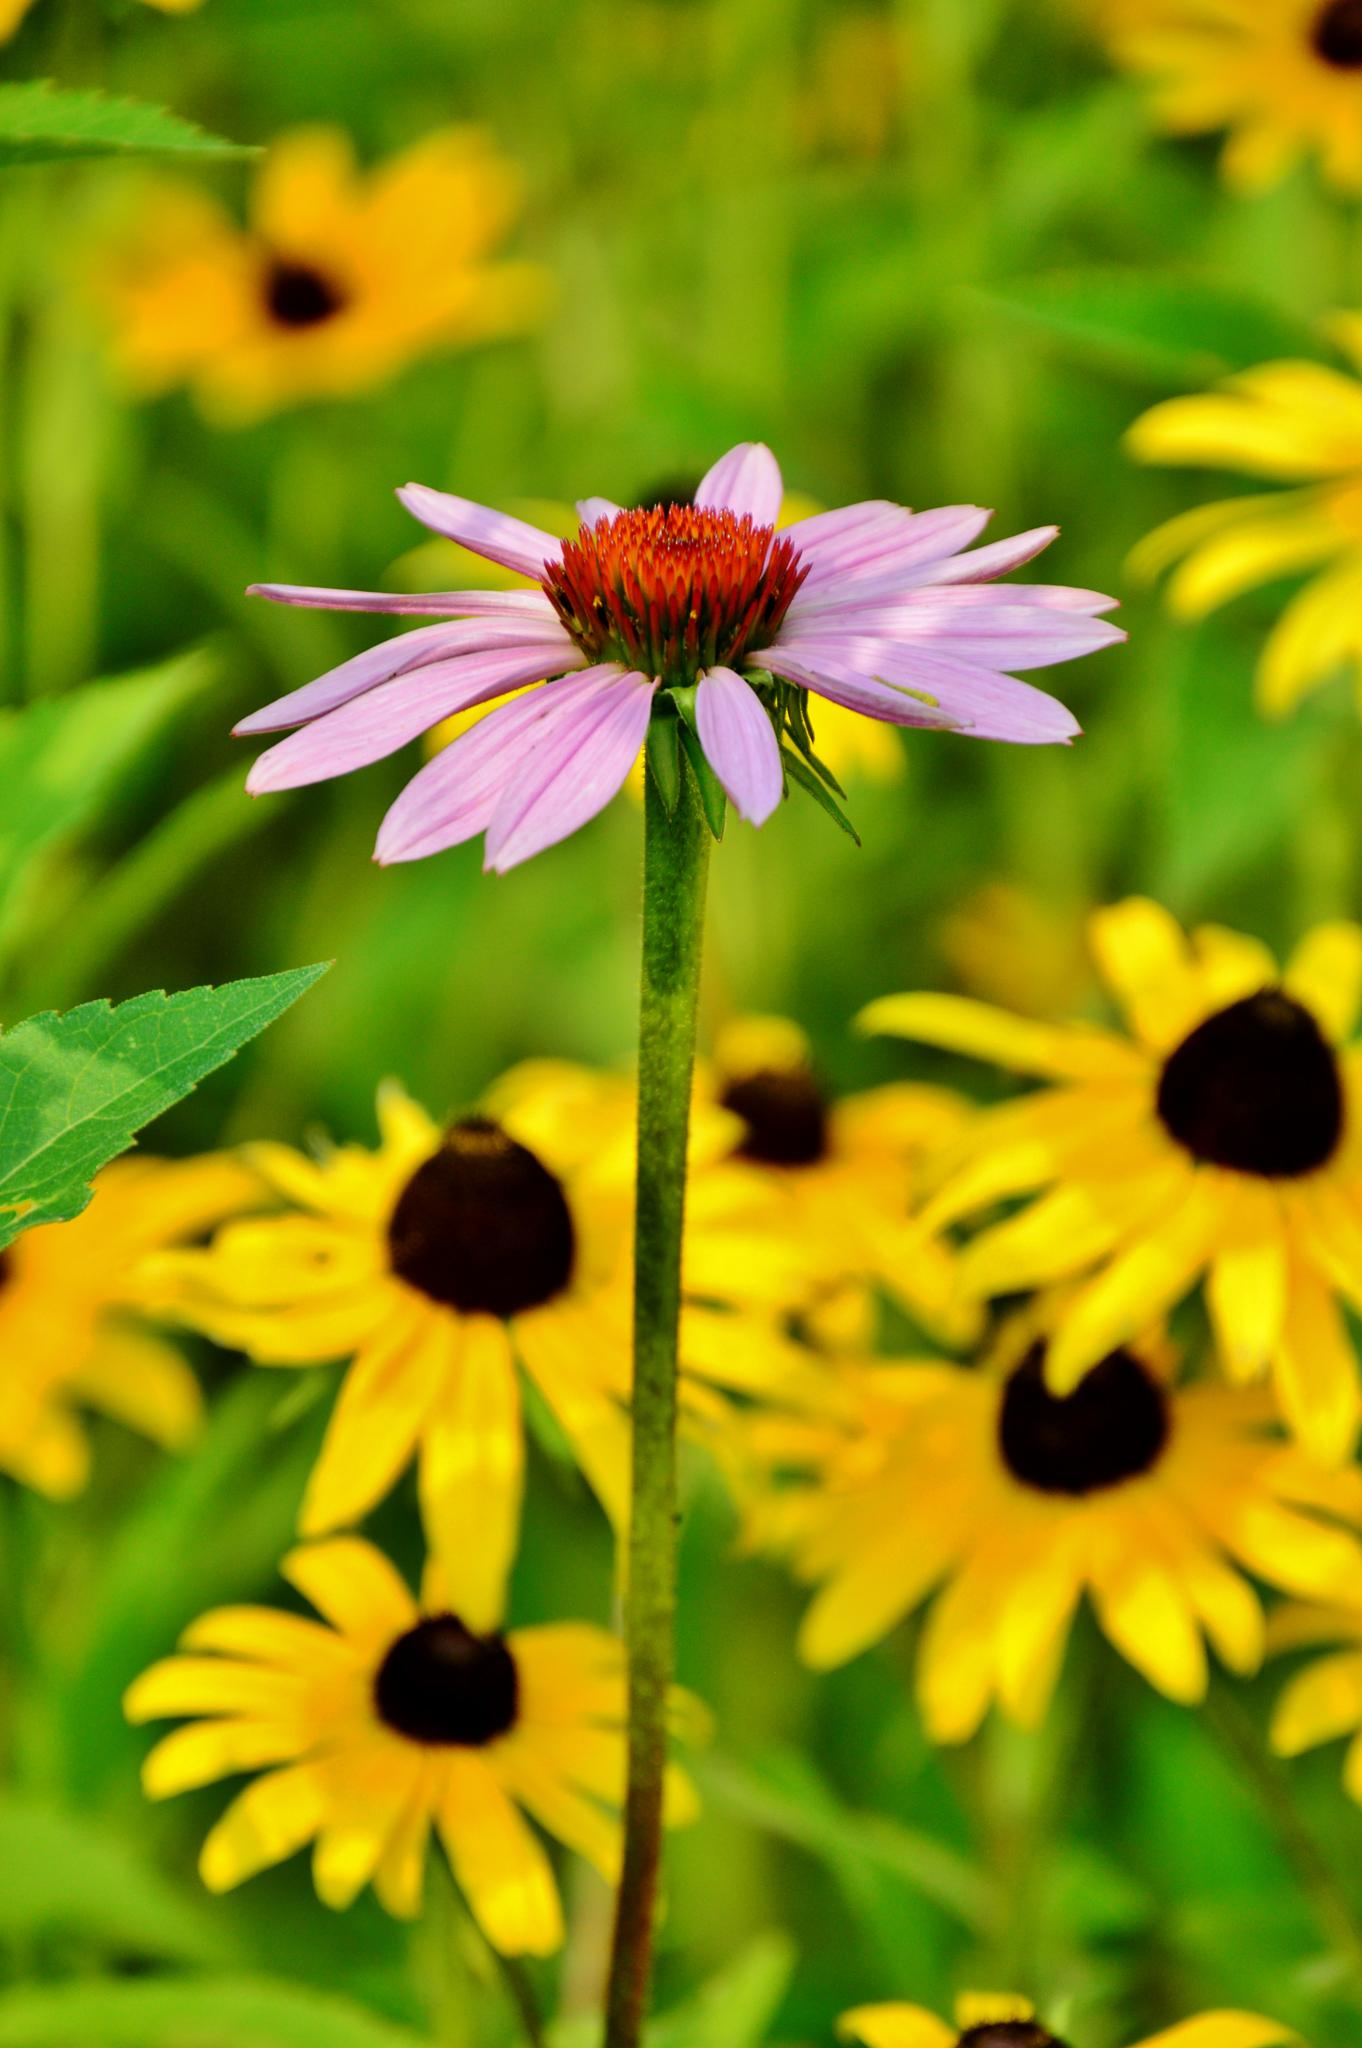 Flower by Doug Fosnight